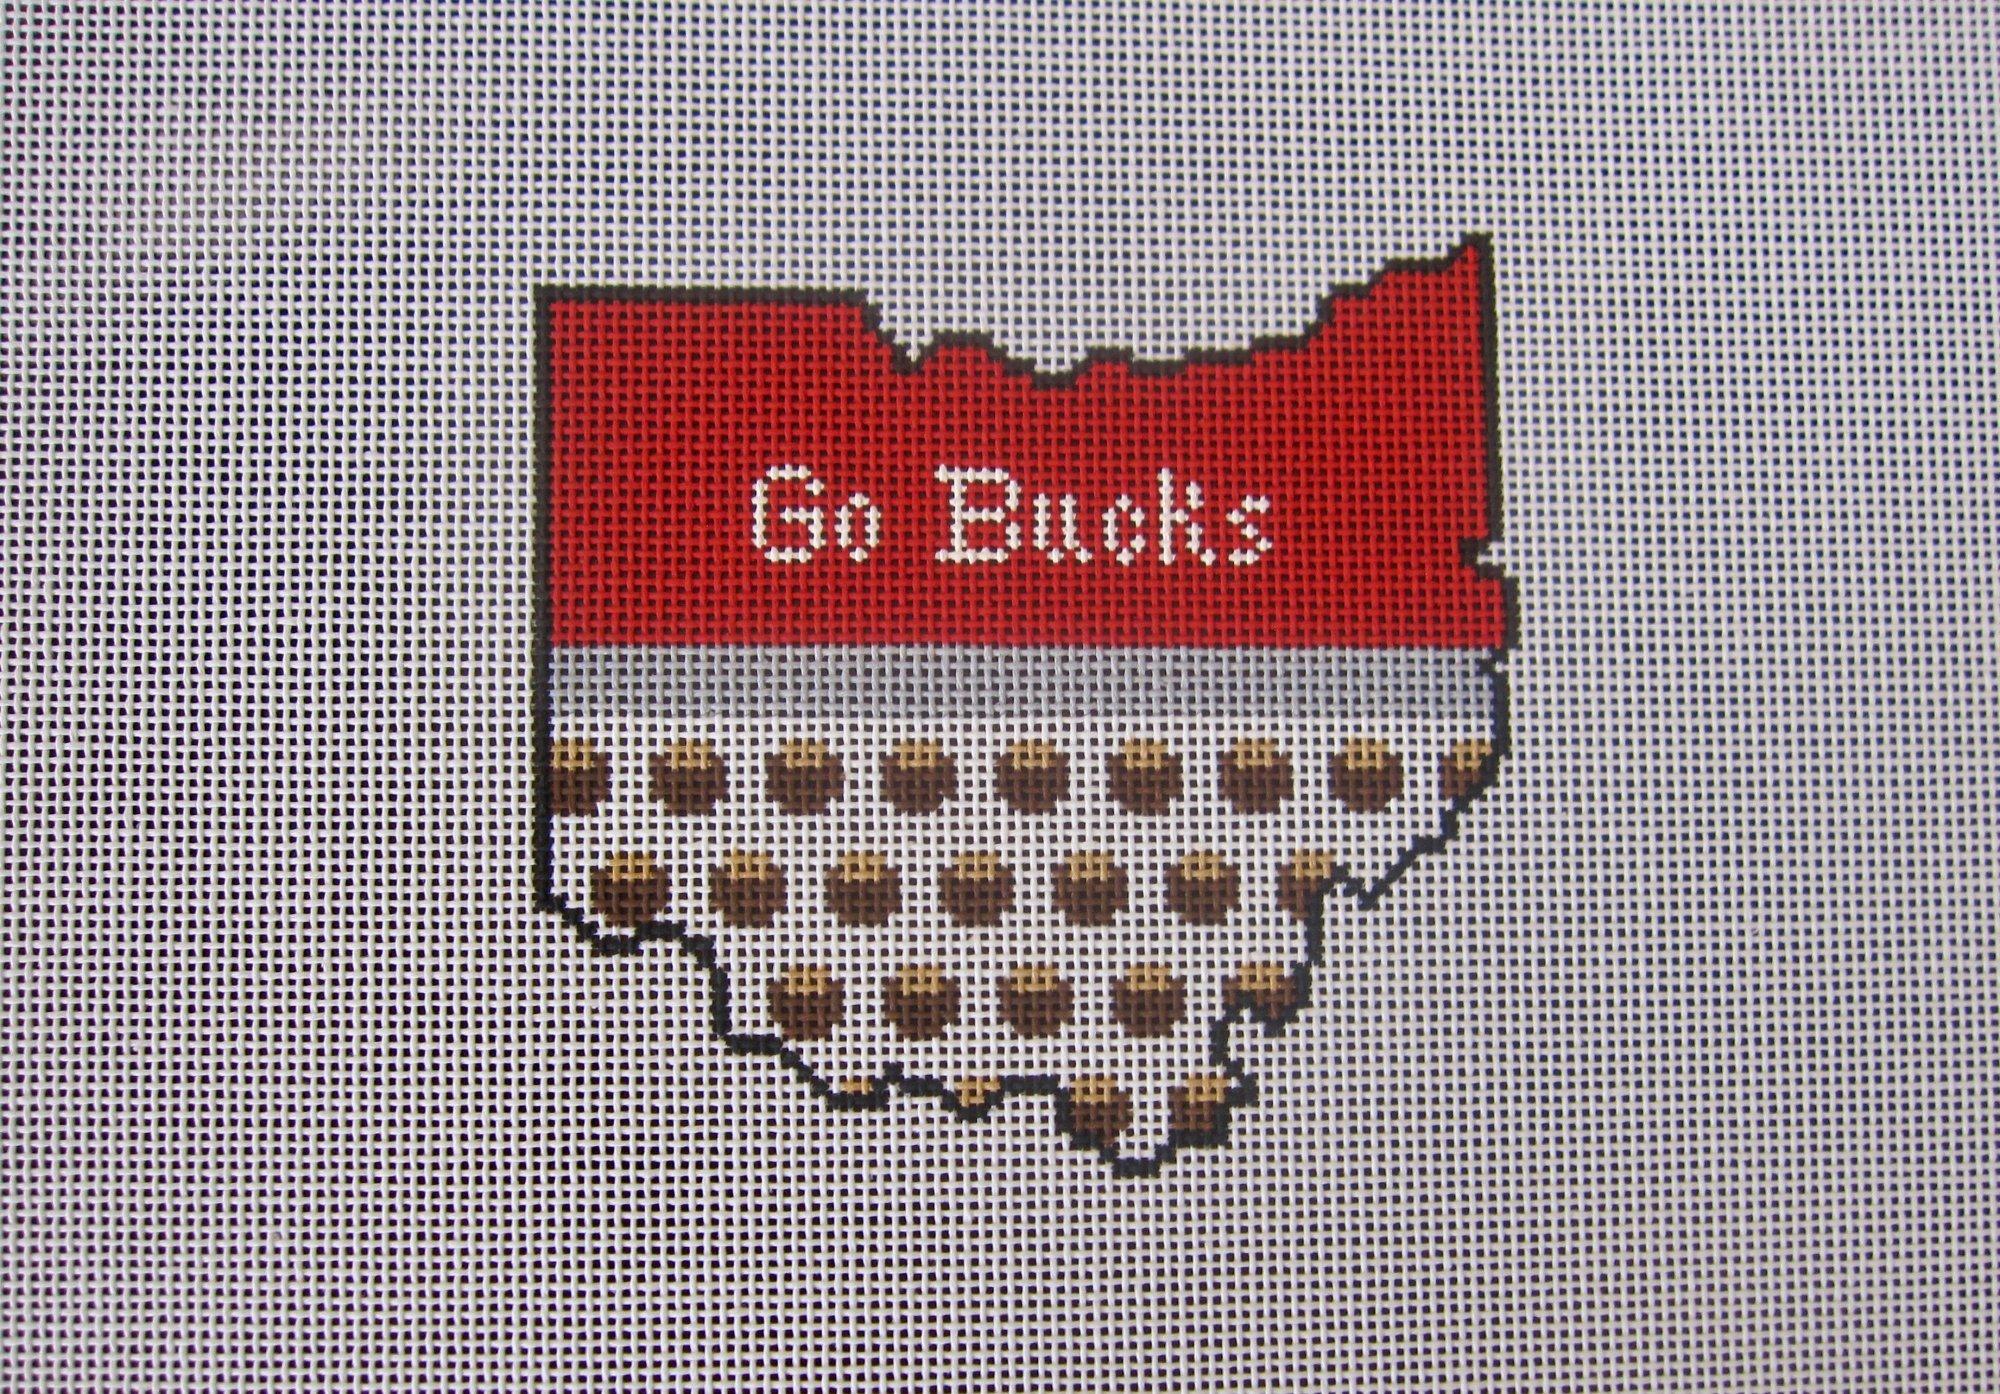 Ohio State Shape - Go Bucks